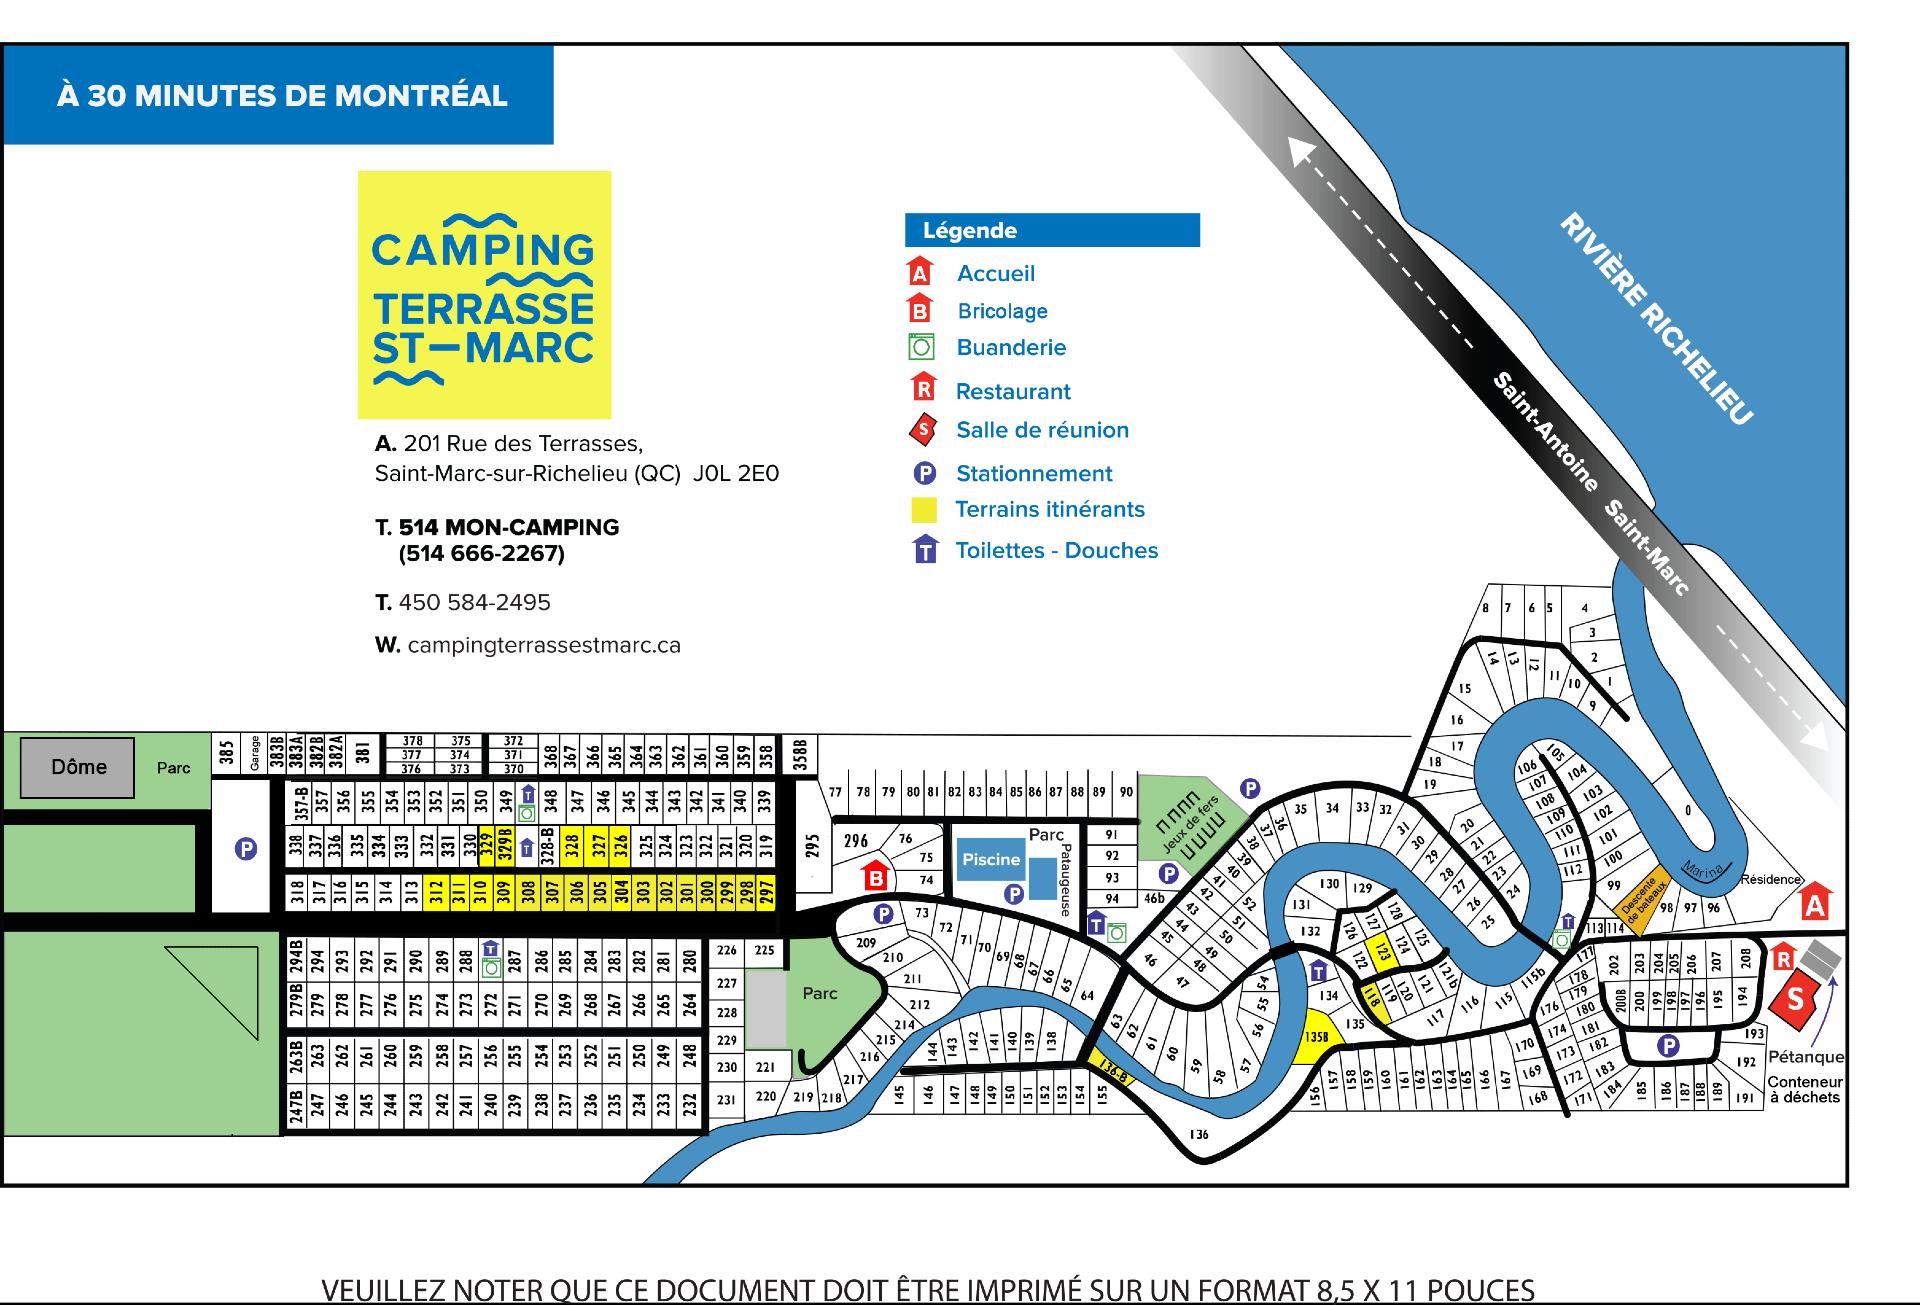 Plan du terrain camping terrasse st marc for Plan terrain